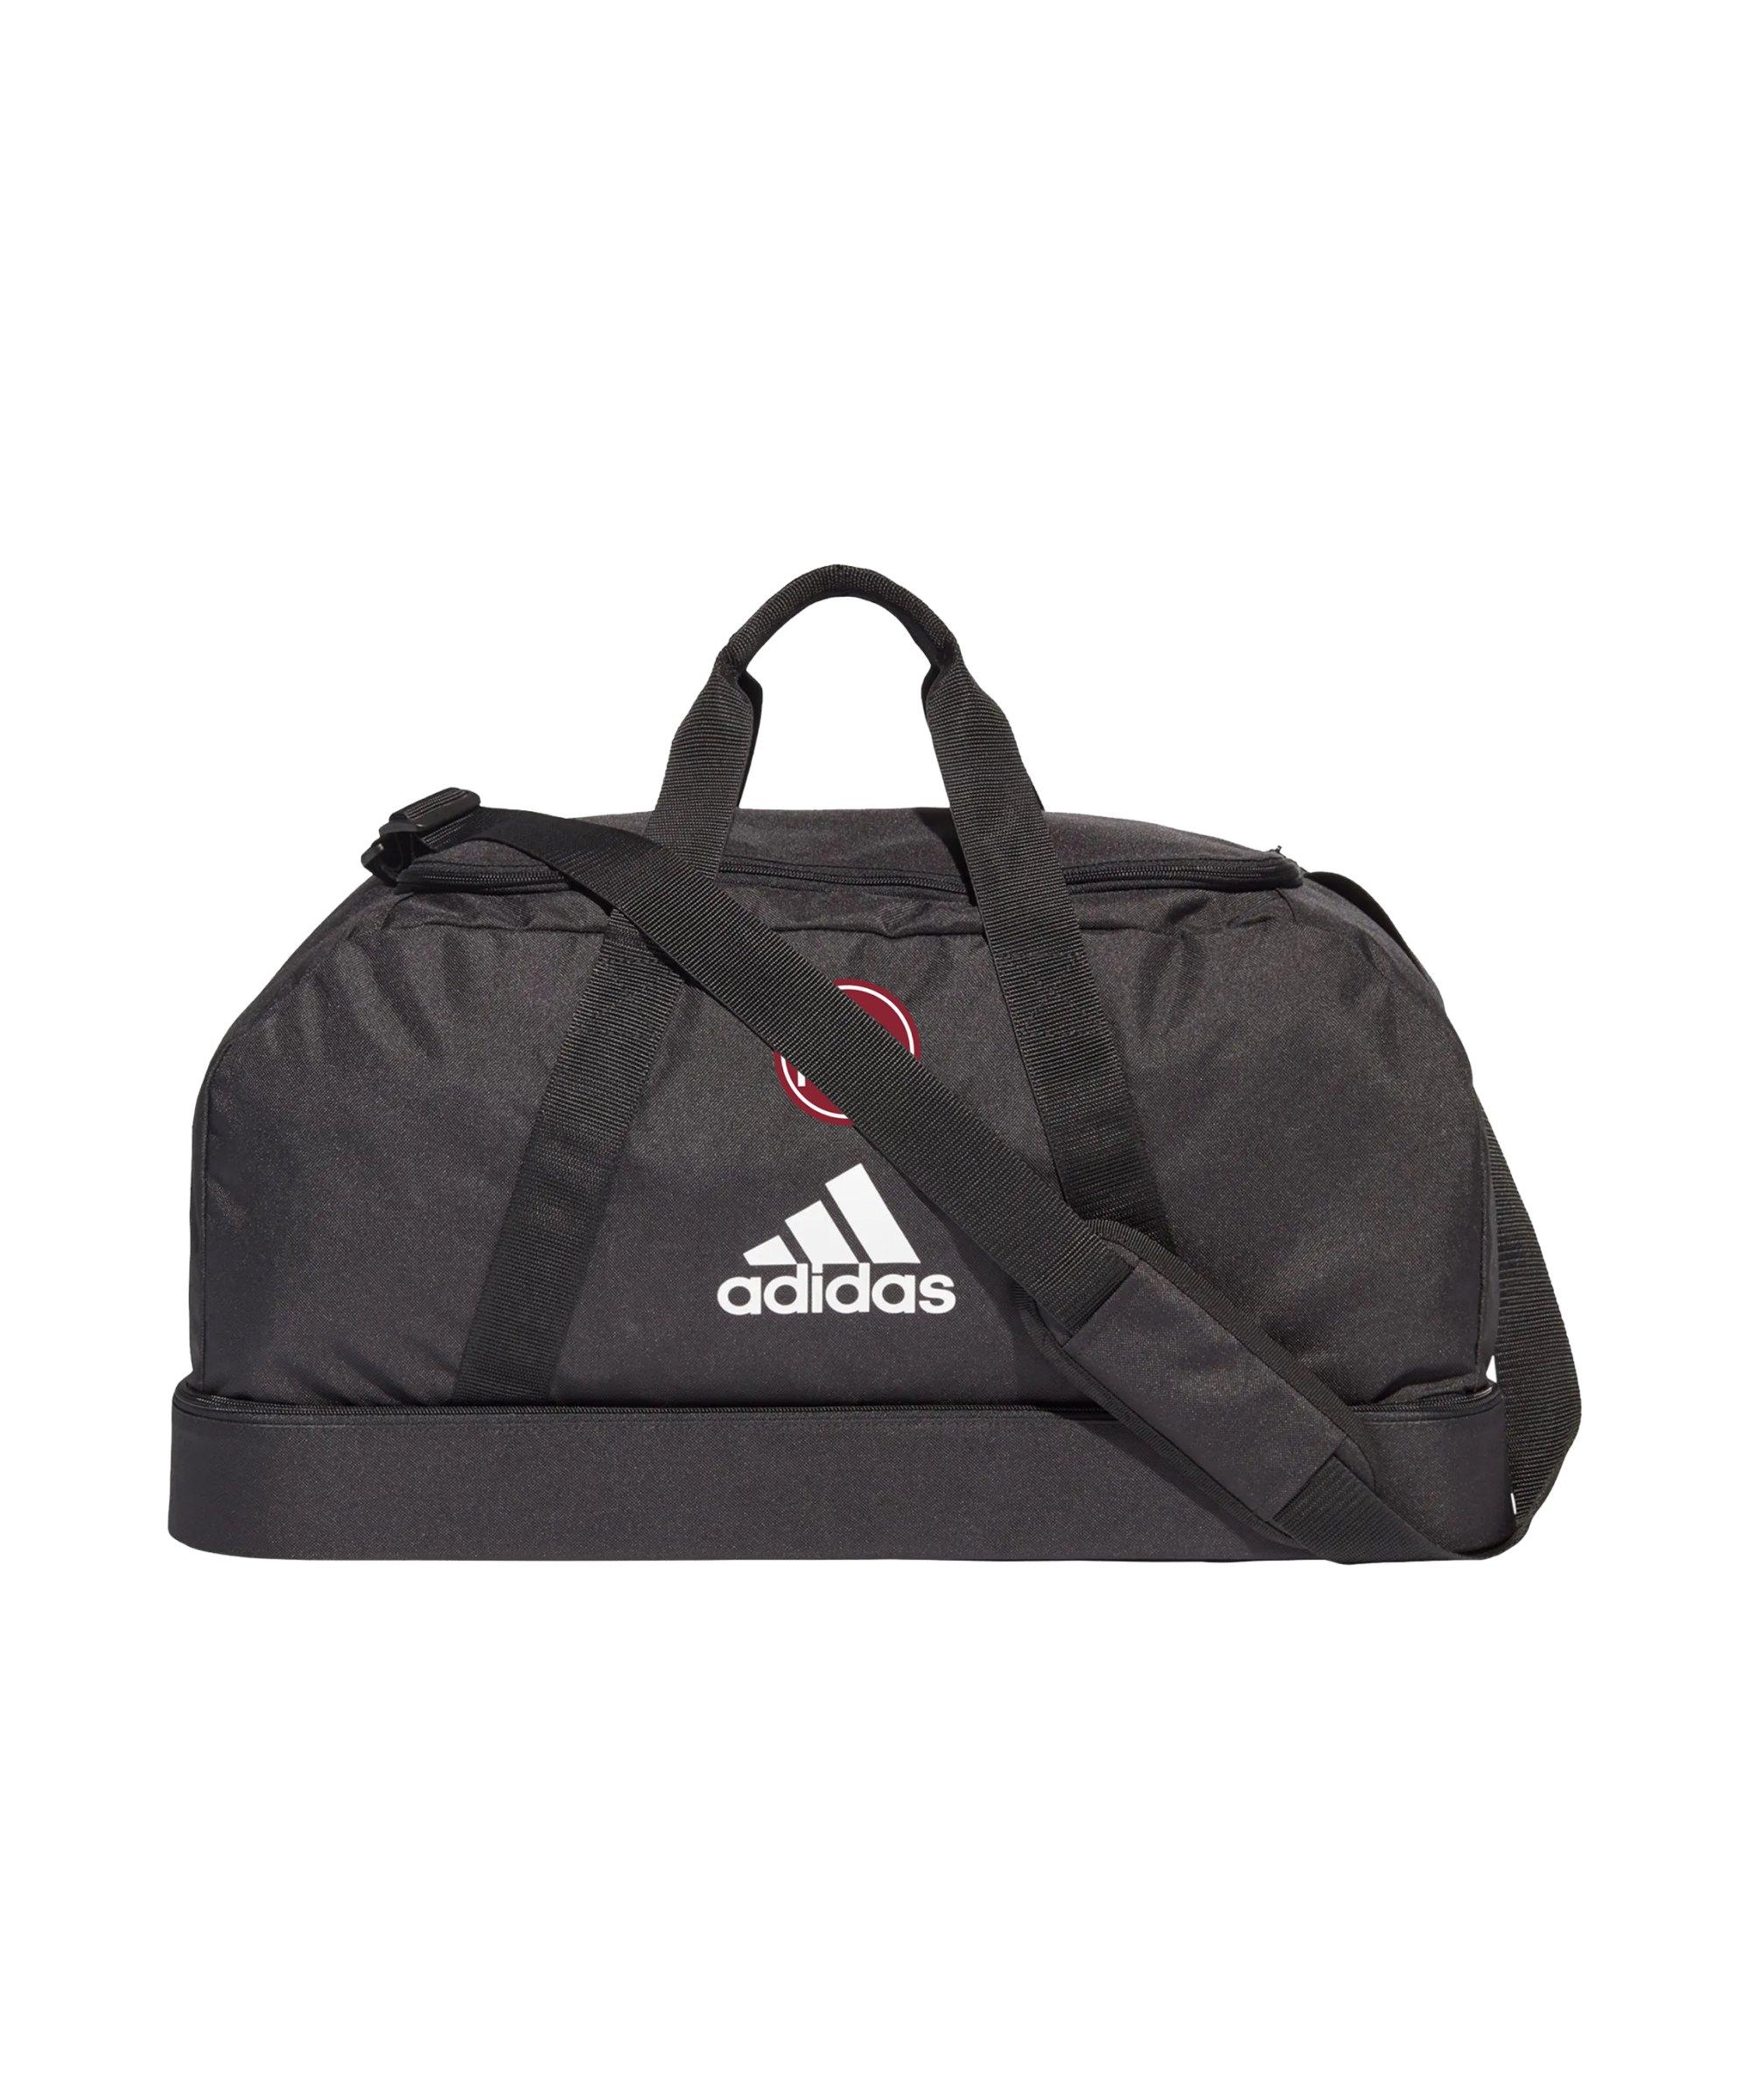 adidas 1. FC Nürnberg Tasche Hardcase Schwarz - schwarz